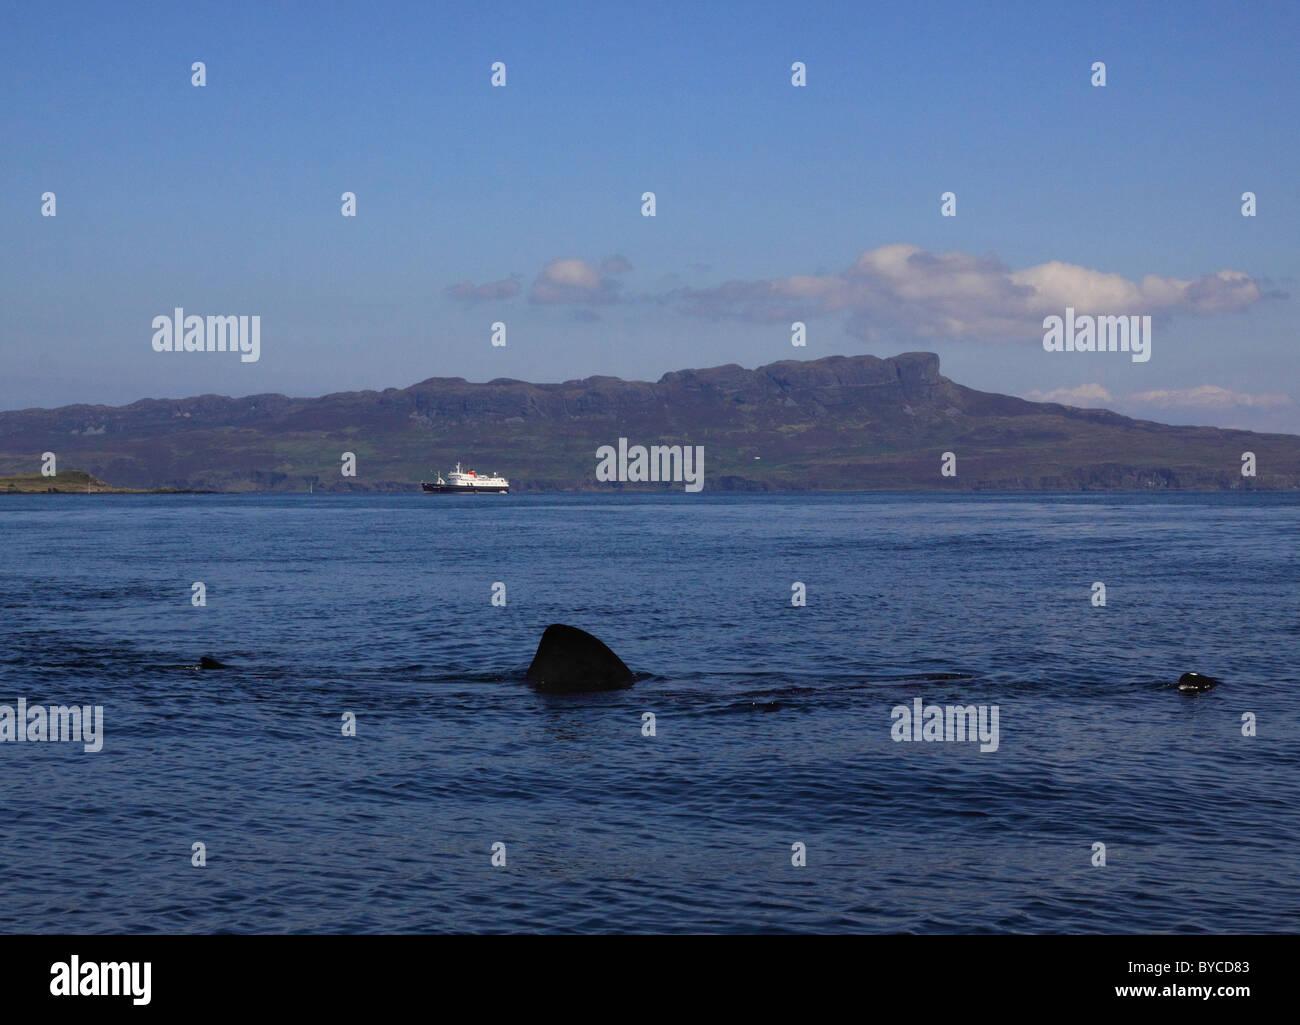 UK Scotland Inverness-shire Sea of Hebrides Basking Shark and the Hebridean Princess and Island of Eigg - Stock Image